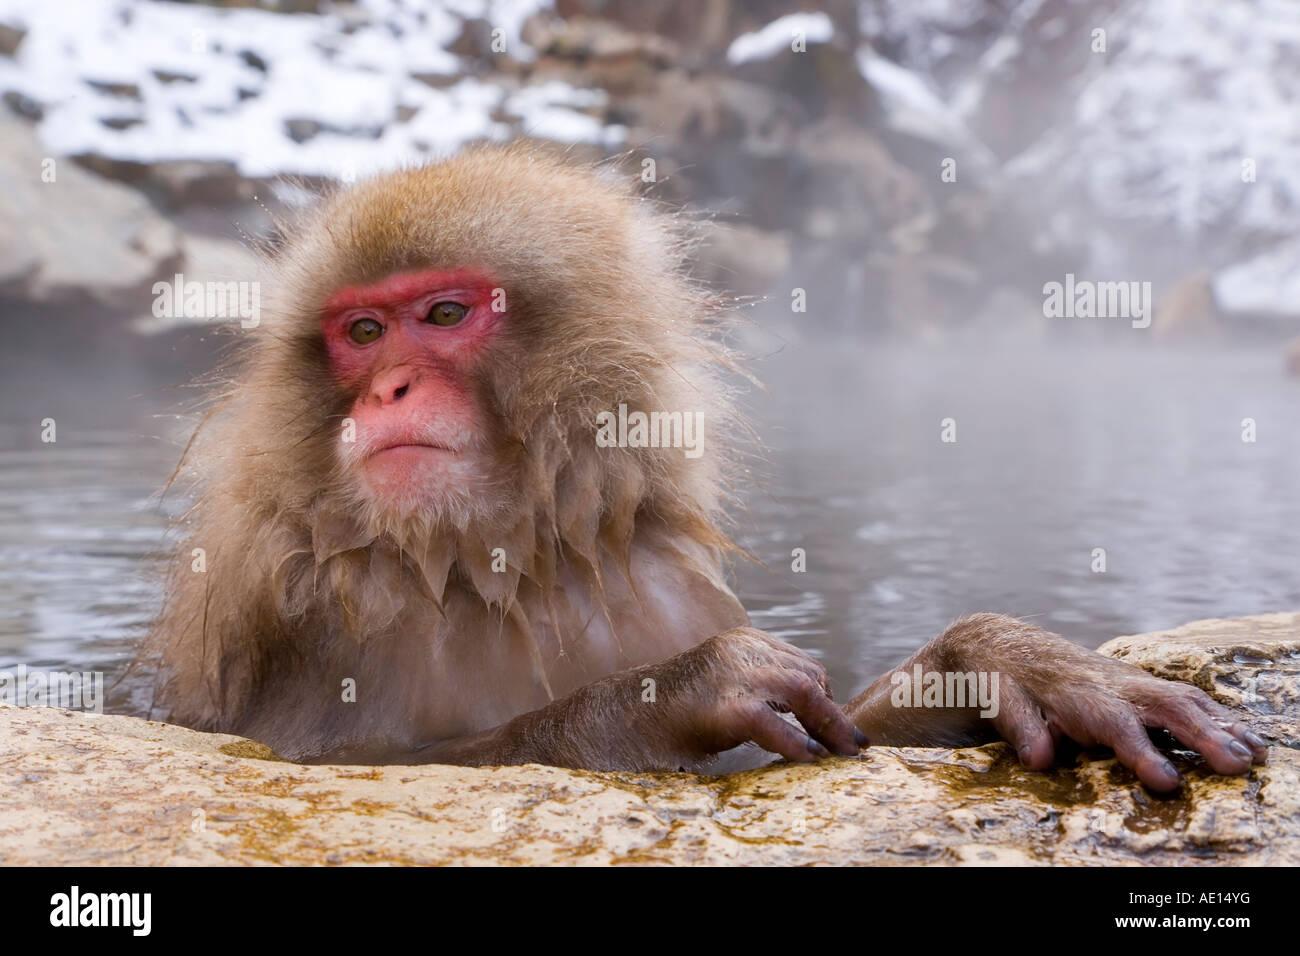 Giapponesi macaque Macaca fuscata Snow monkey in ammollo hot thermal spring pool Joshin etsu Parco Nazionale di Immagini Stock